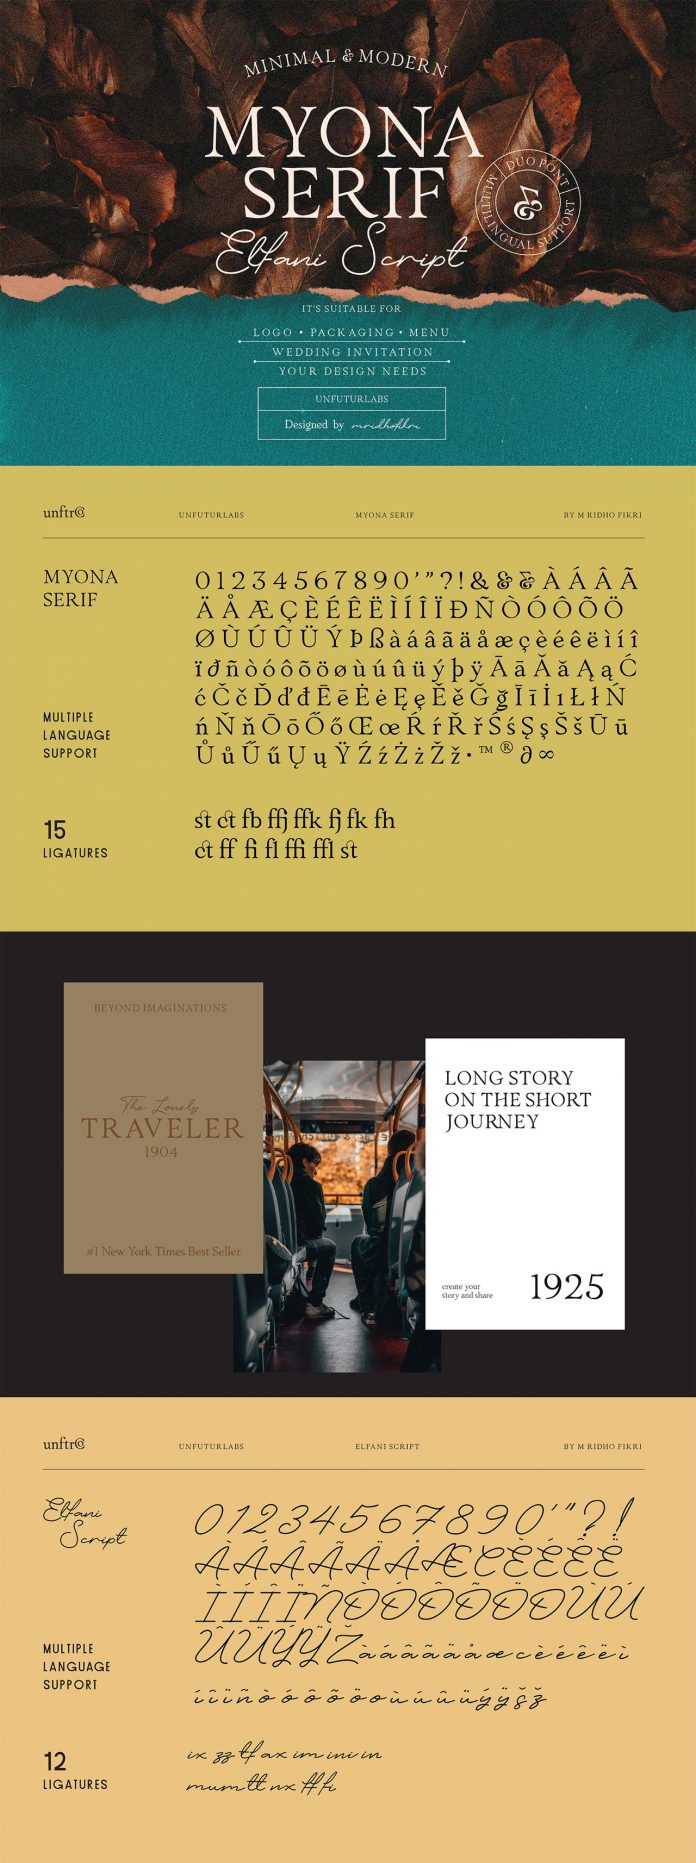 Myona Serif Font and Elfani Script Font plus extras.